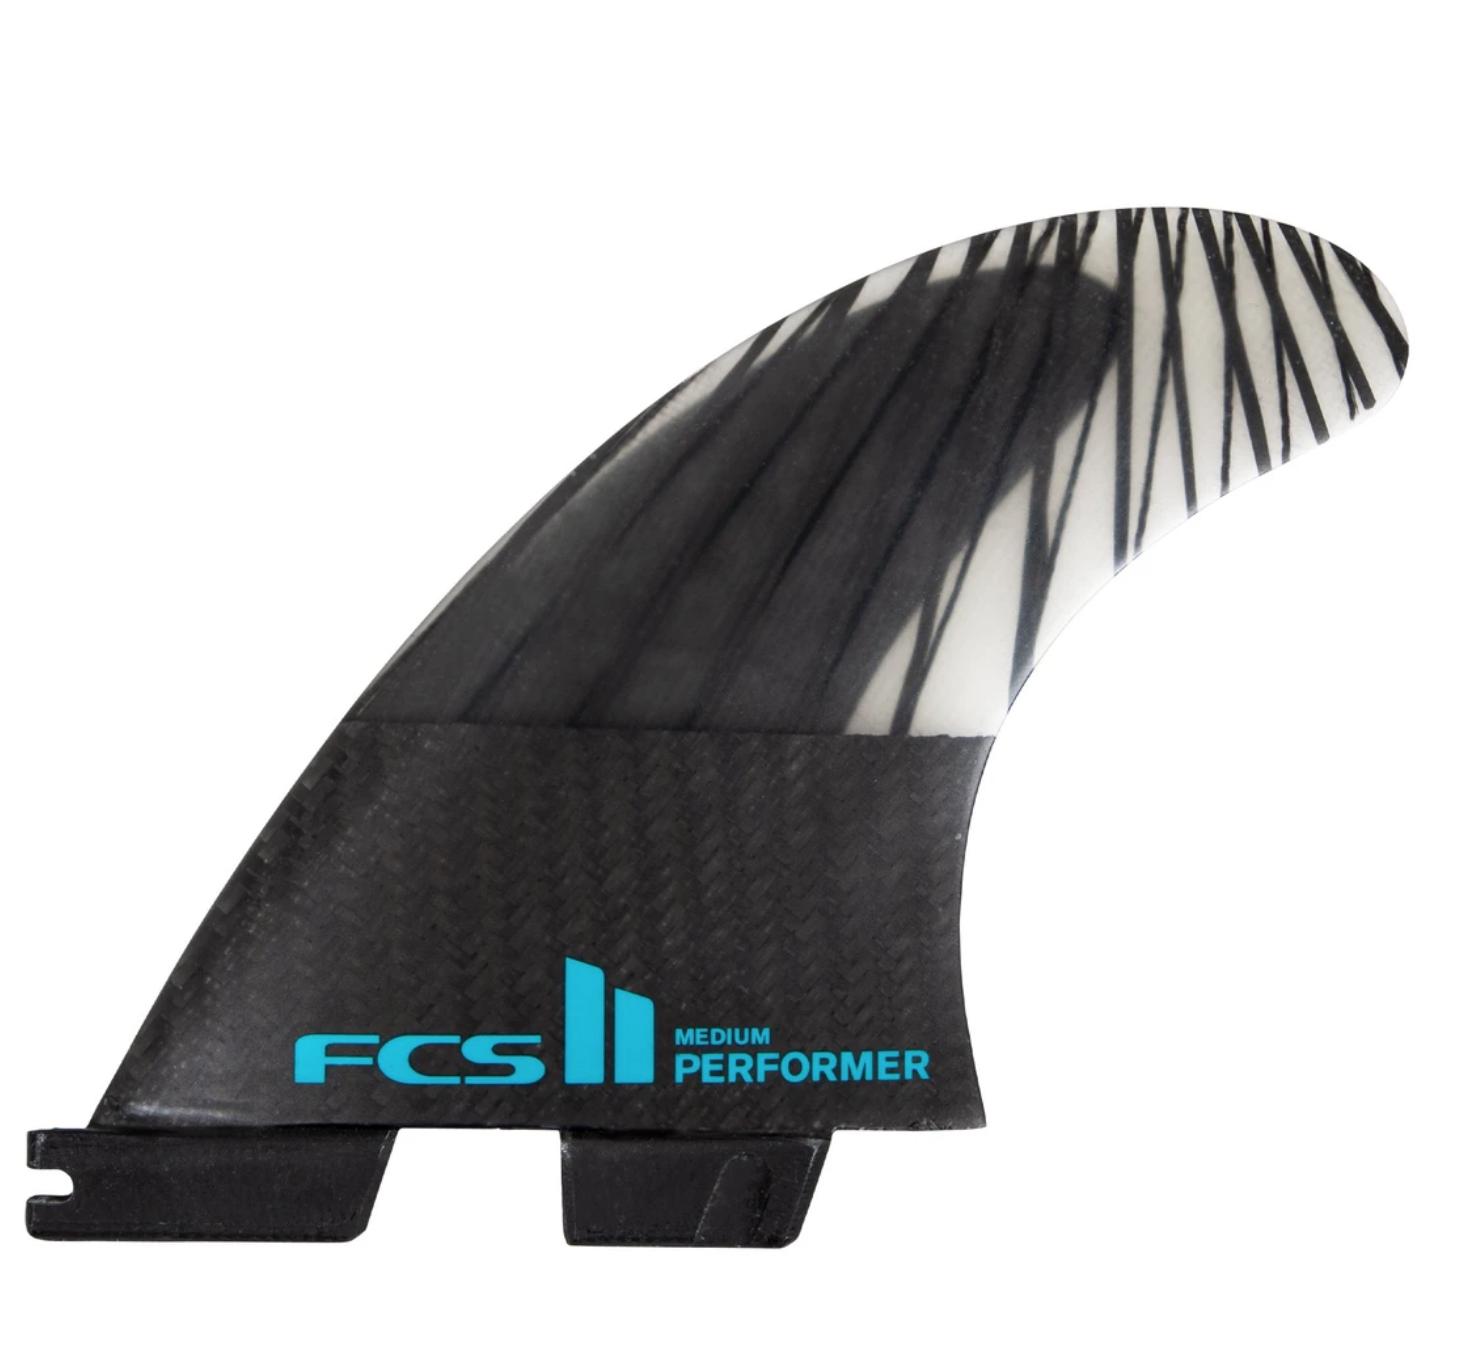 FCS FCS II PREFORMER PC CARBON TEAL S TRI SET